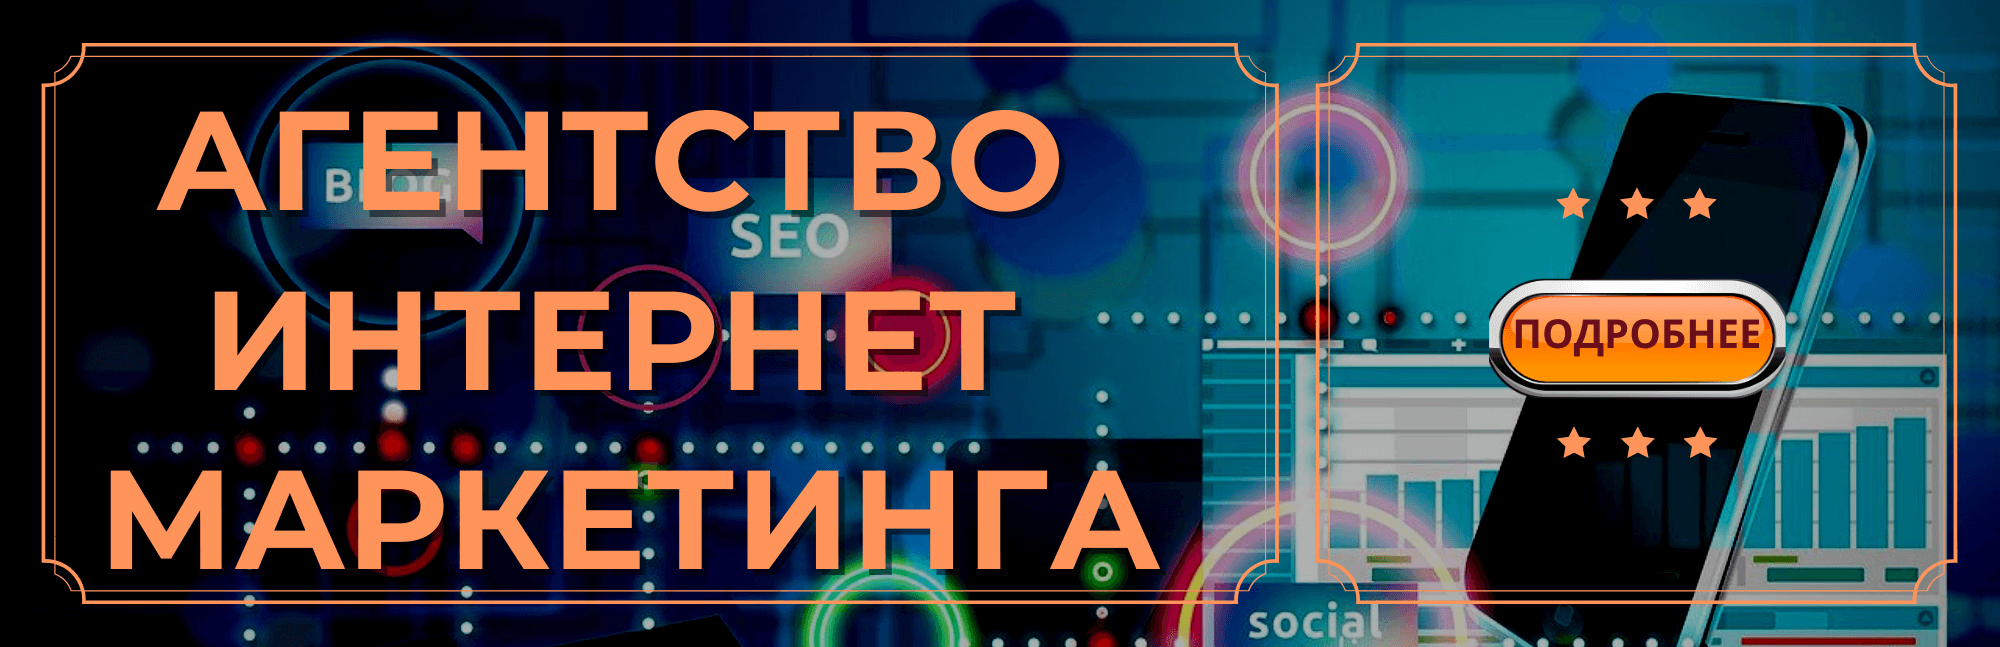 Digital-агентство WebSuperovo